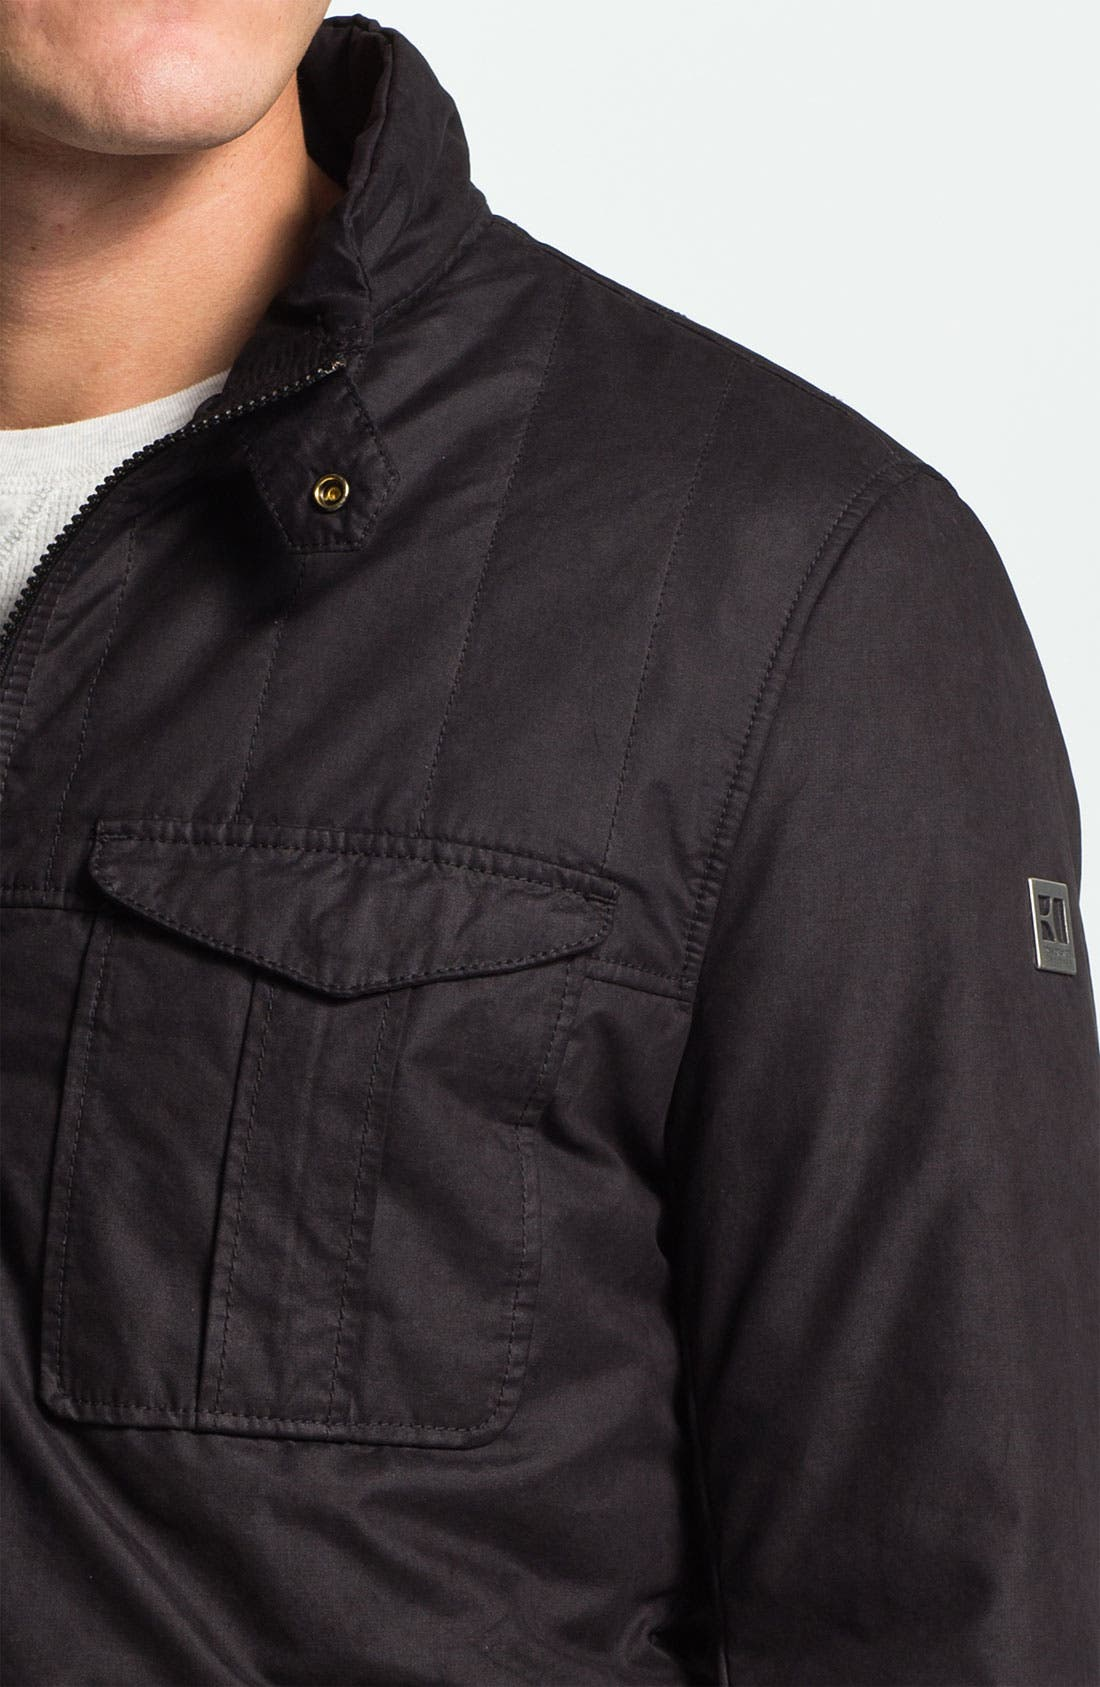 BOSS ORANGE,                             'Onso' Jacket,                             Alternate thumbnail 2, color,                             001